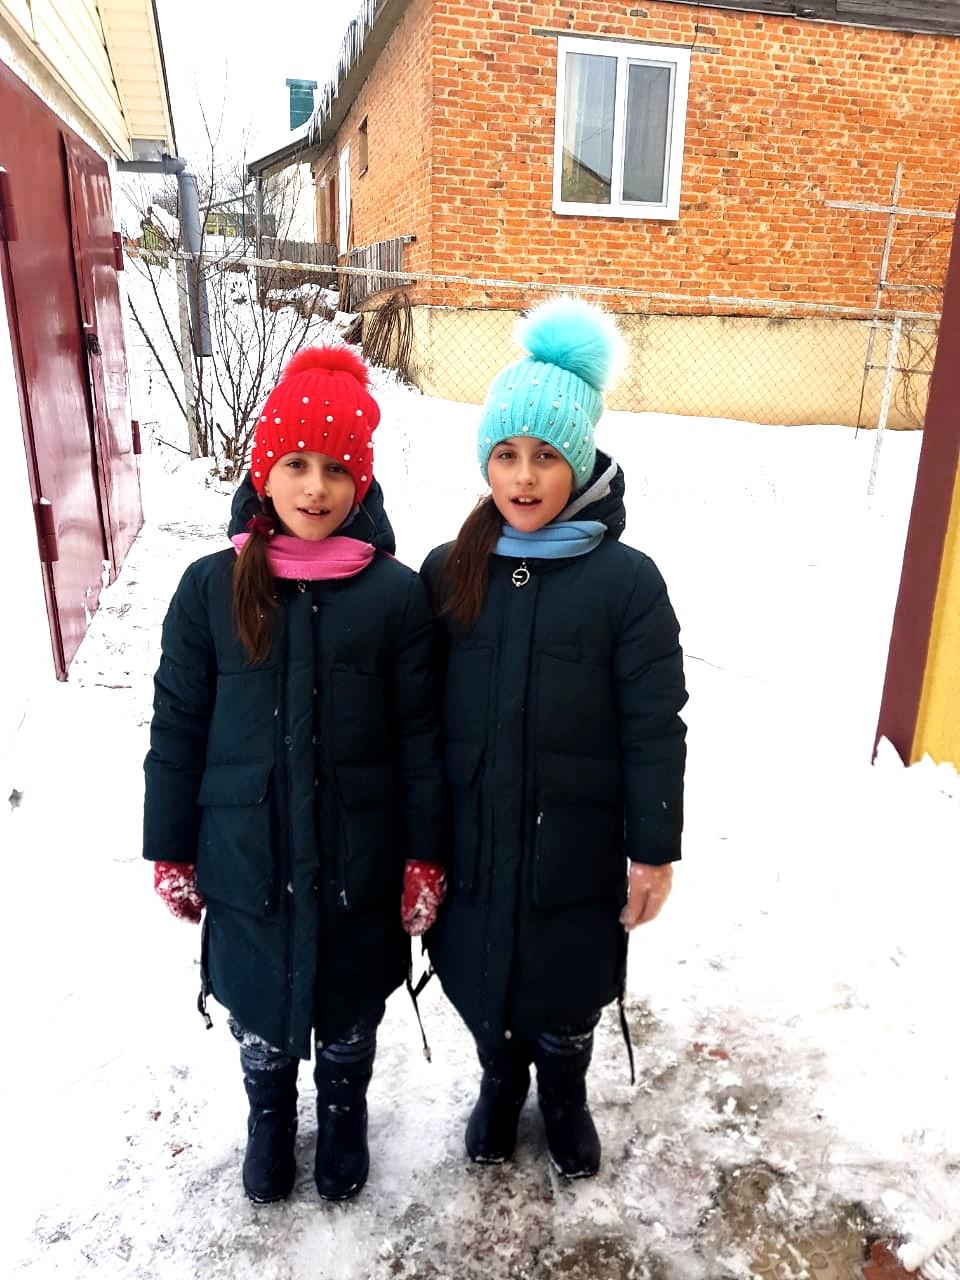 Свежая прогулка. Веселая зима